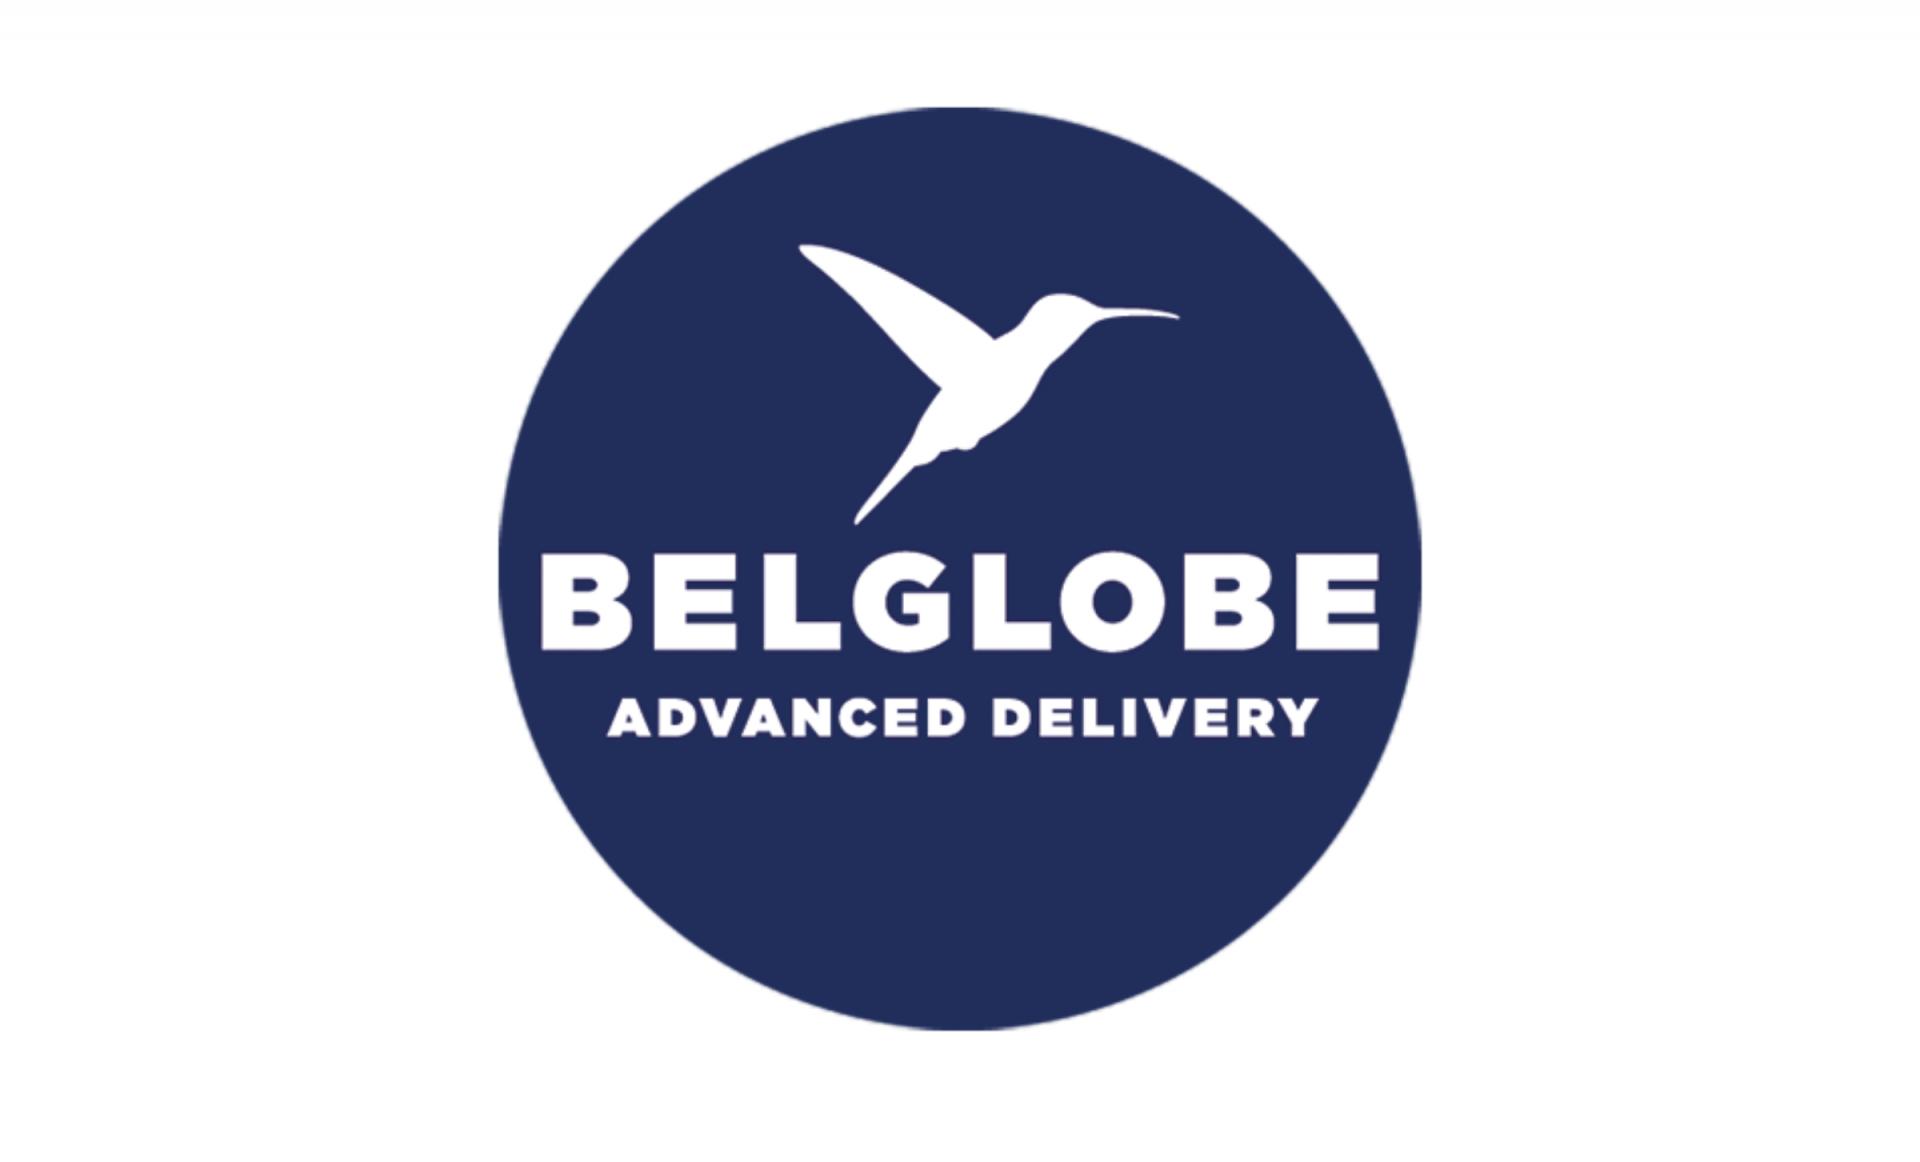 Belglobe